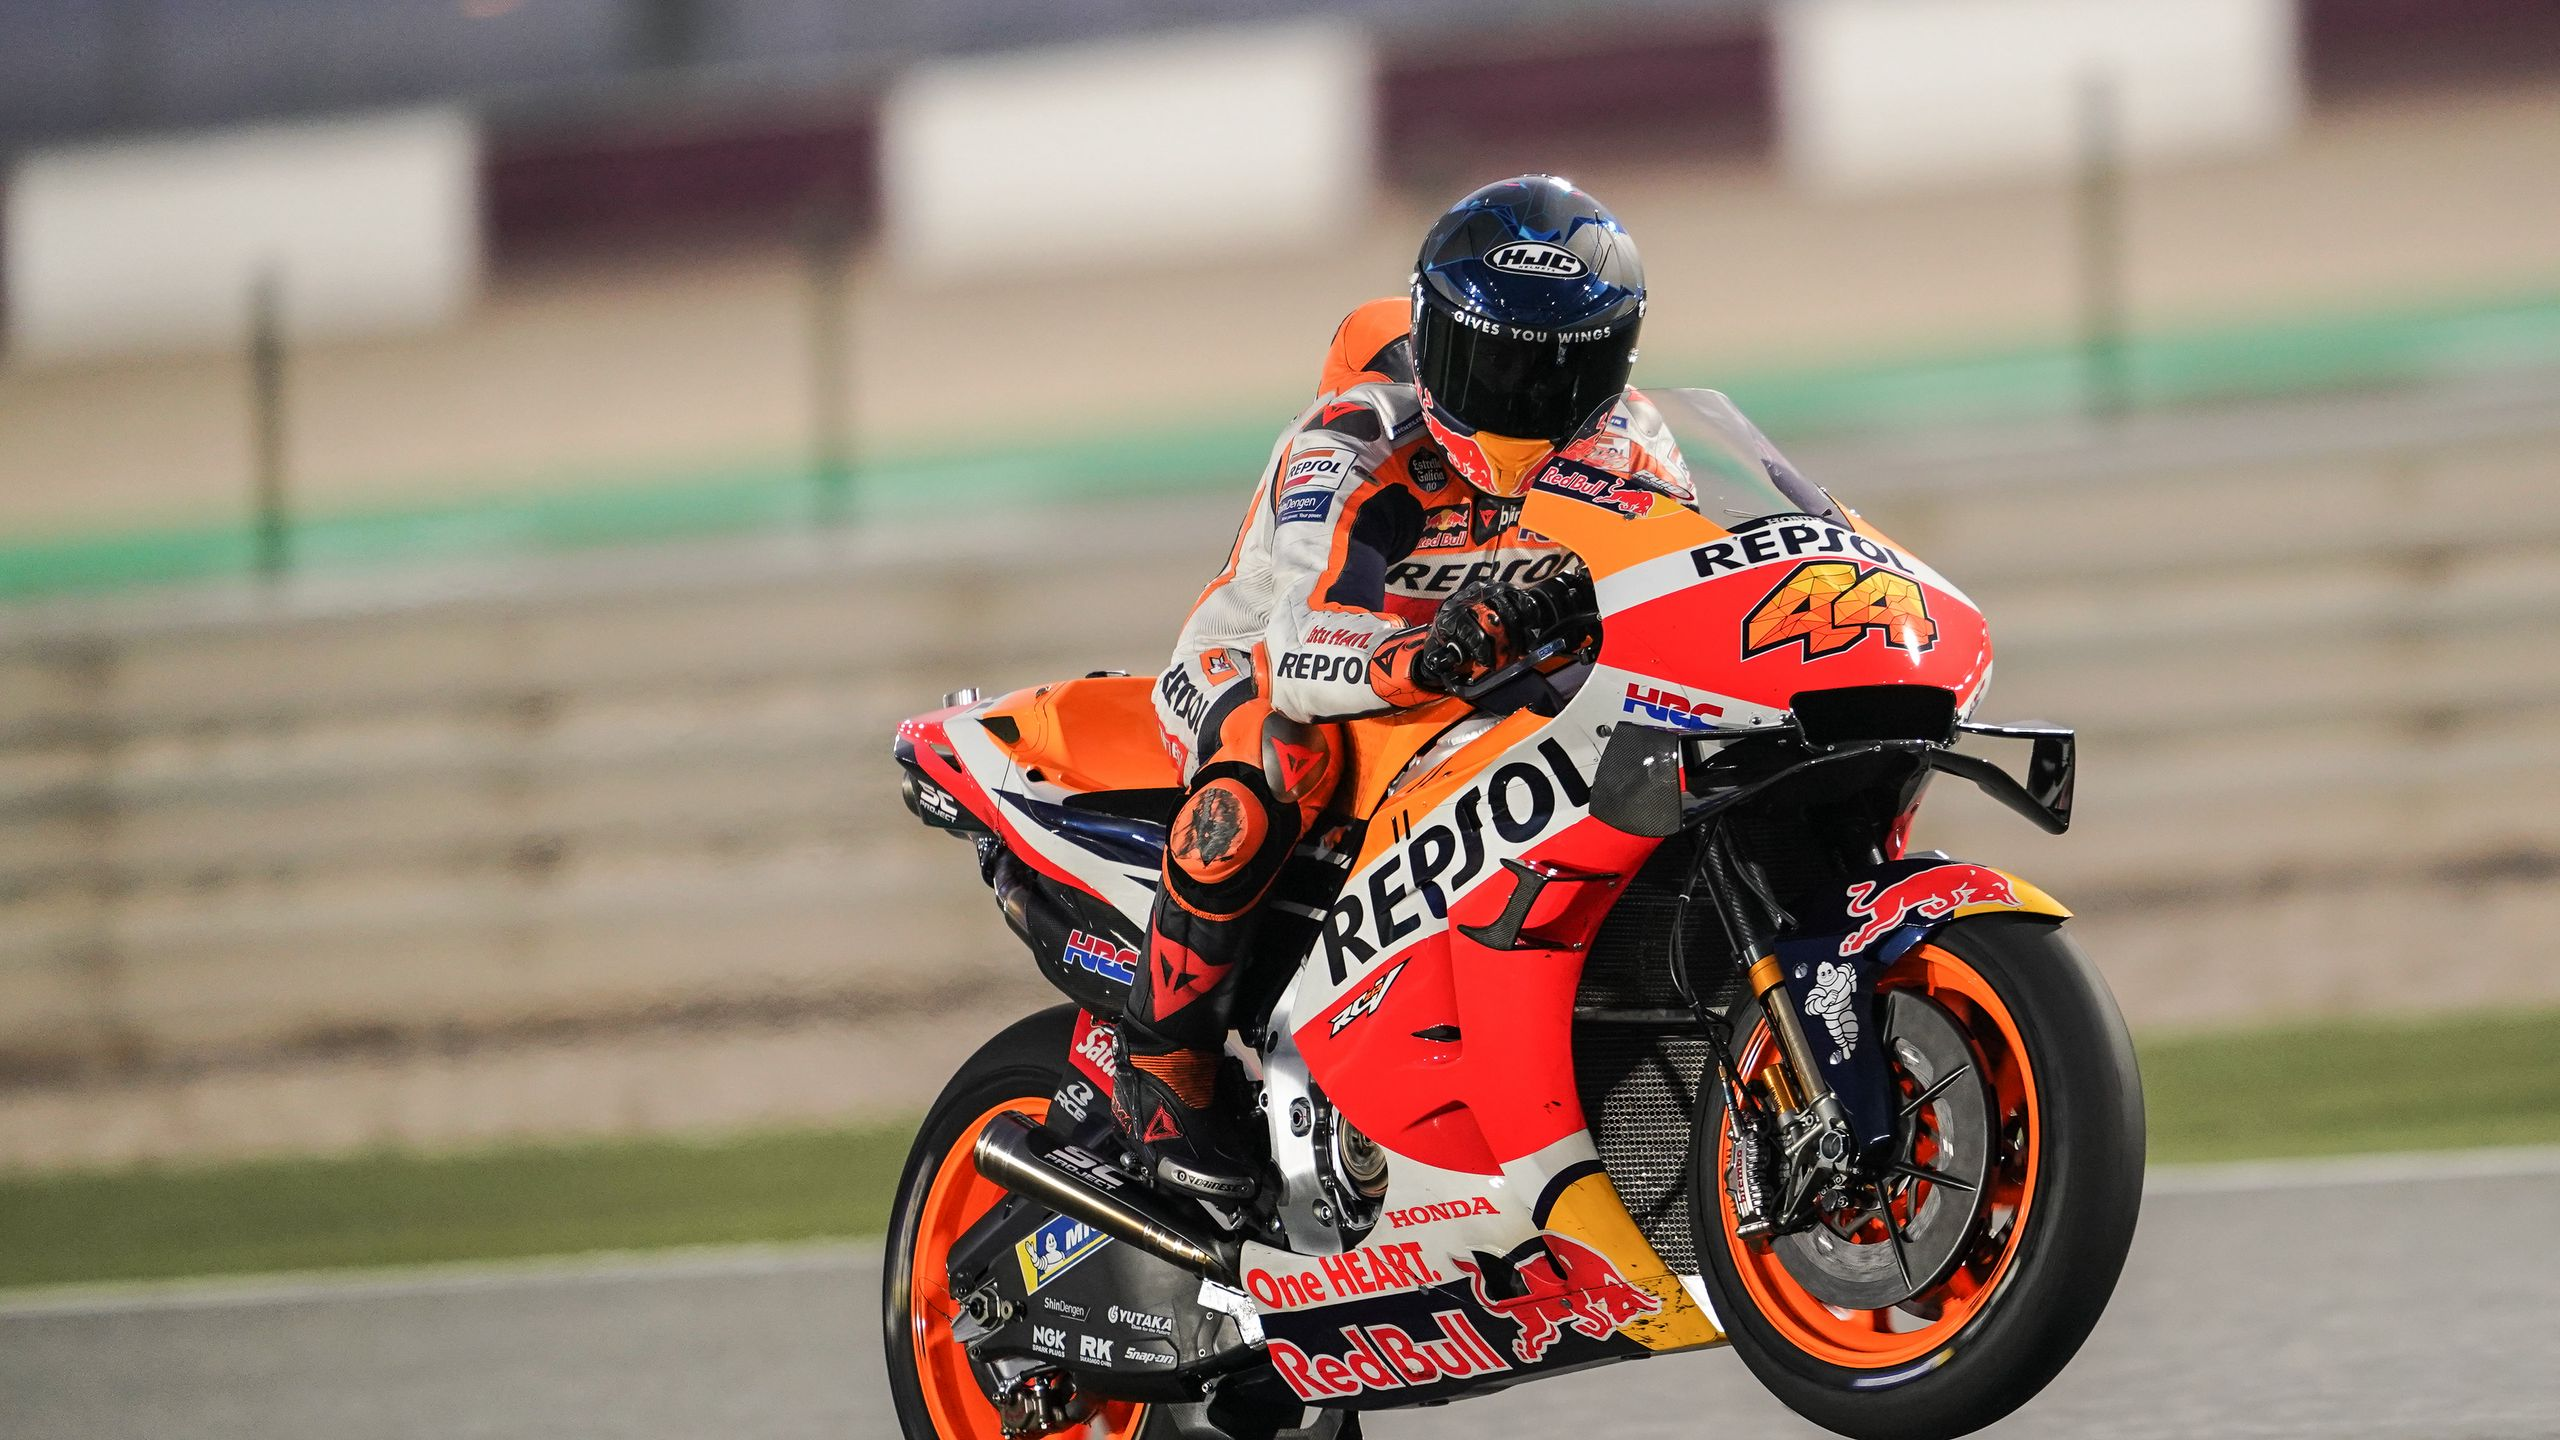 2560x1440 Wallpaper honda, motorcycle, motorcyclist, helmet, speed, track, orange